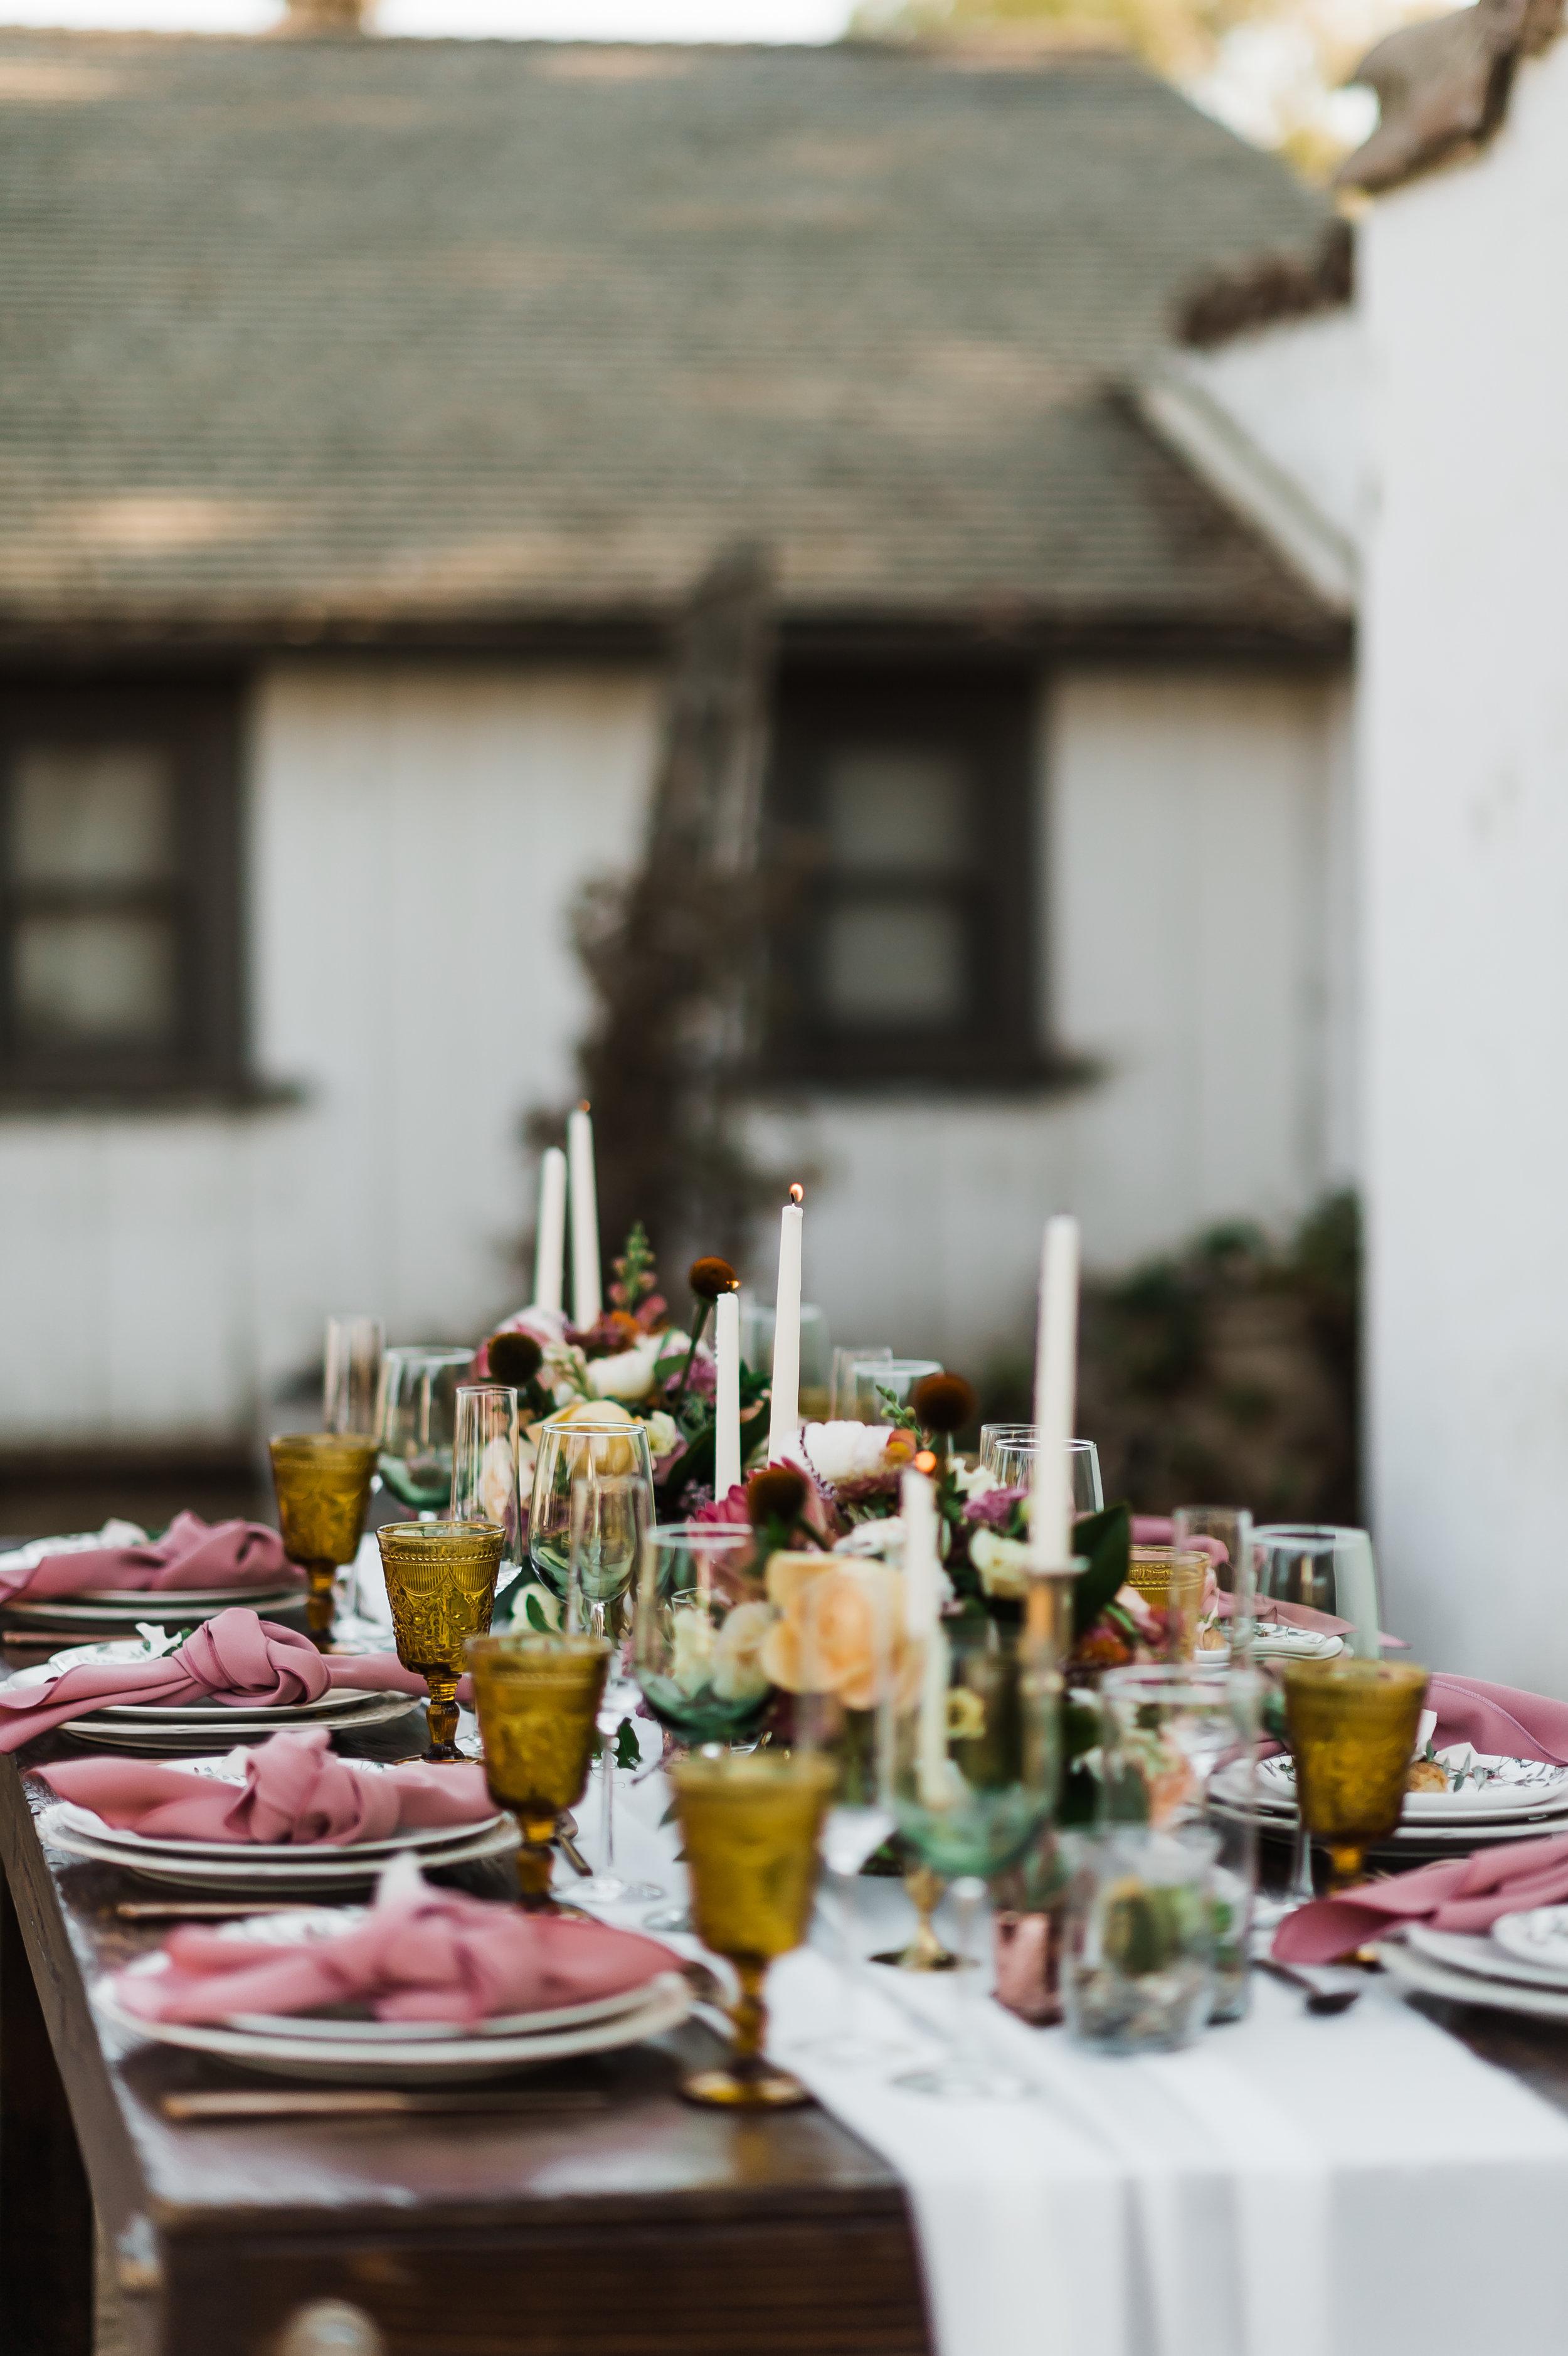 www.santabarbarawedding.com | Michelle Ramirez Photography | Olivas Adobe | Karen Marie Events | Tangled Lotus | Amigo Party Rentals | Dreams America Linens | Table Place Settings